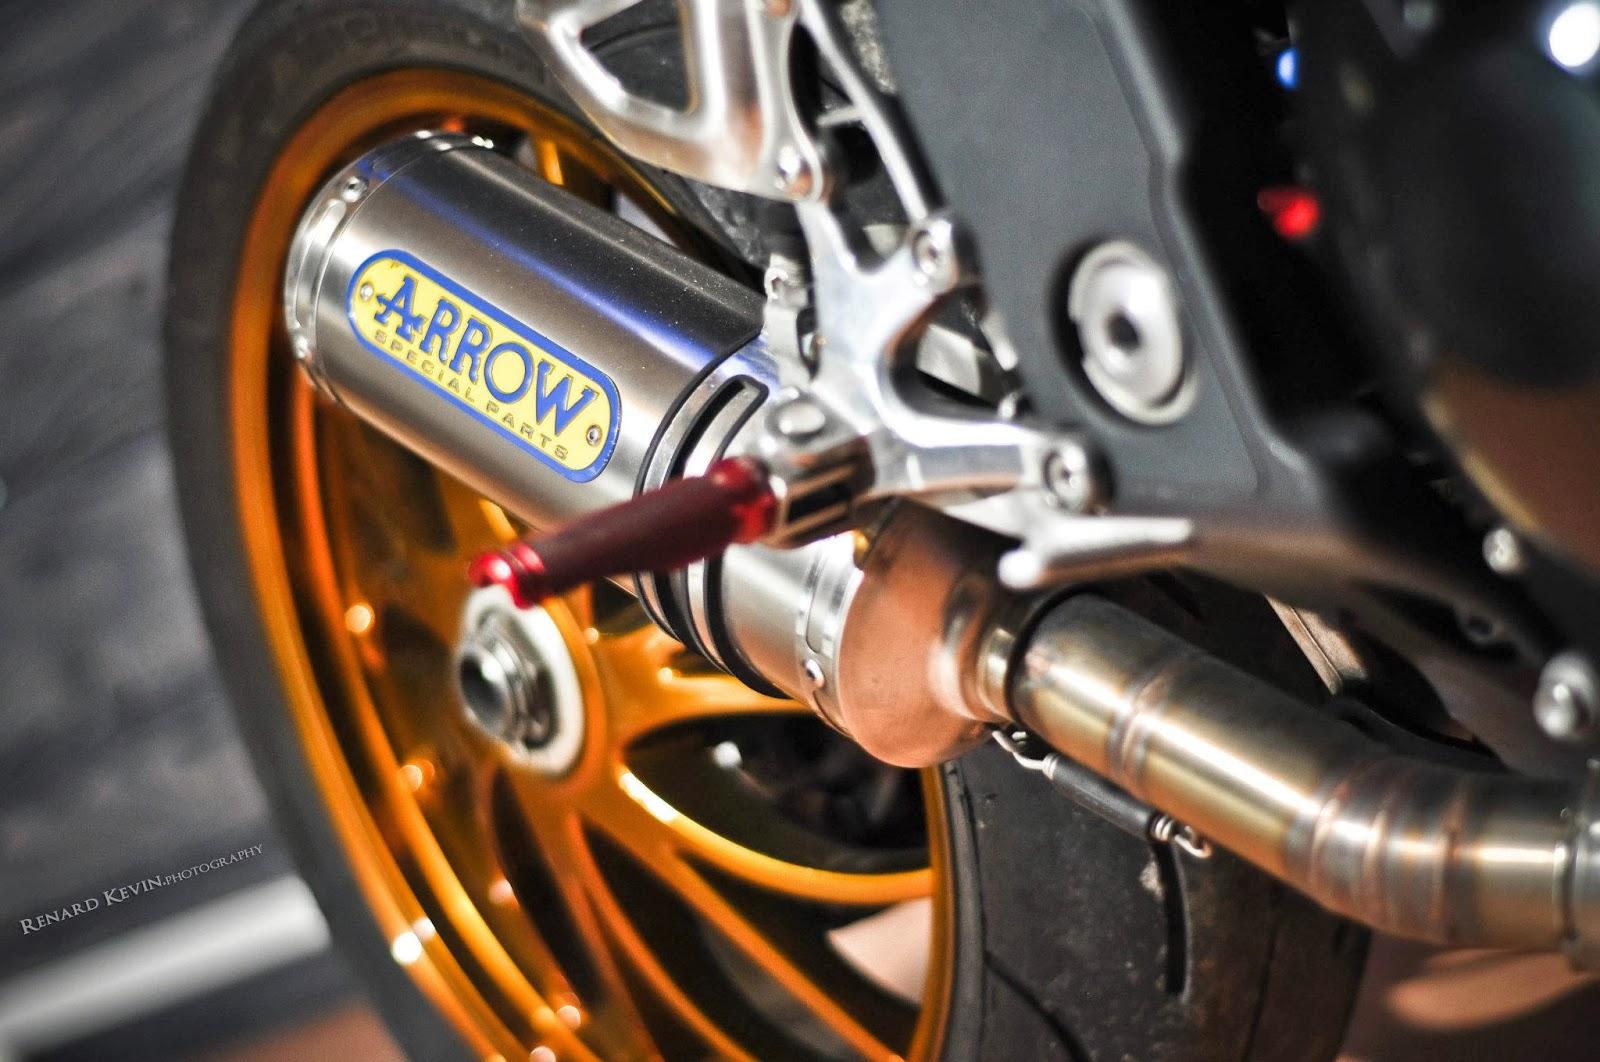 Triumph Speed Triple Wiring Diagram In Addition Triumph Daytona 955i